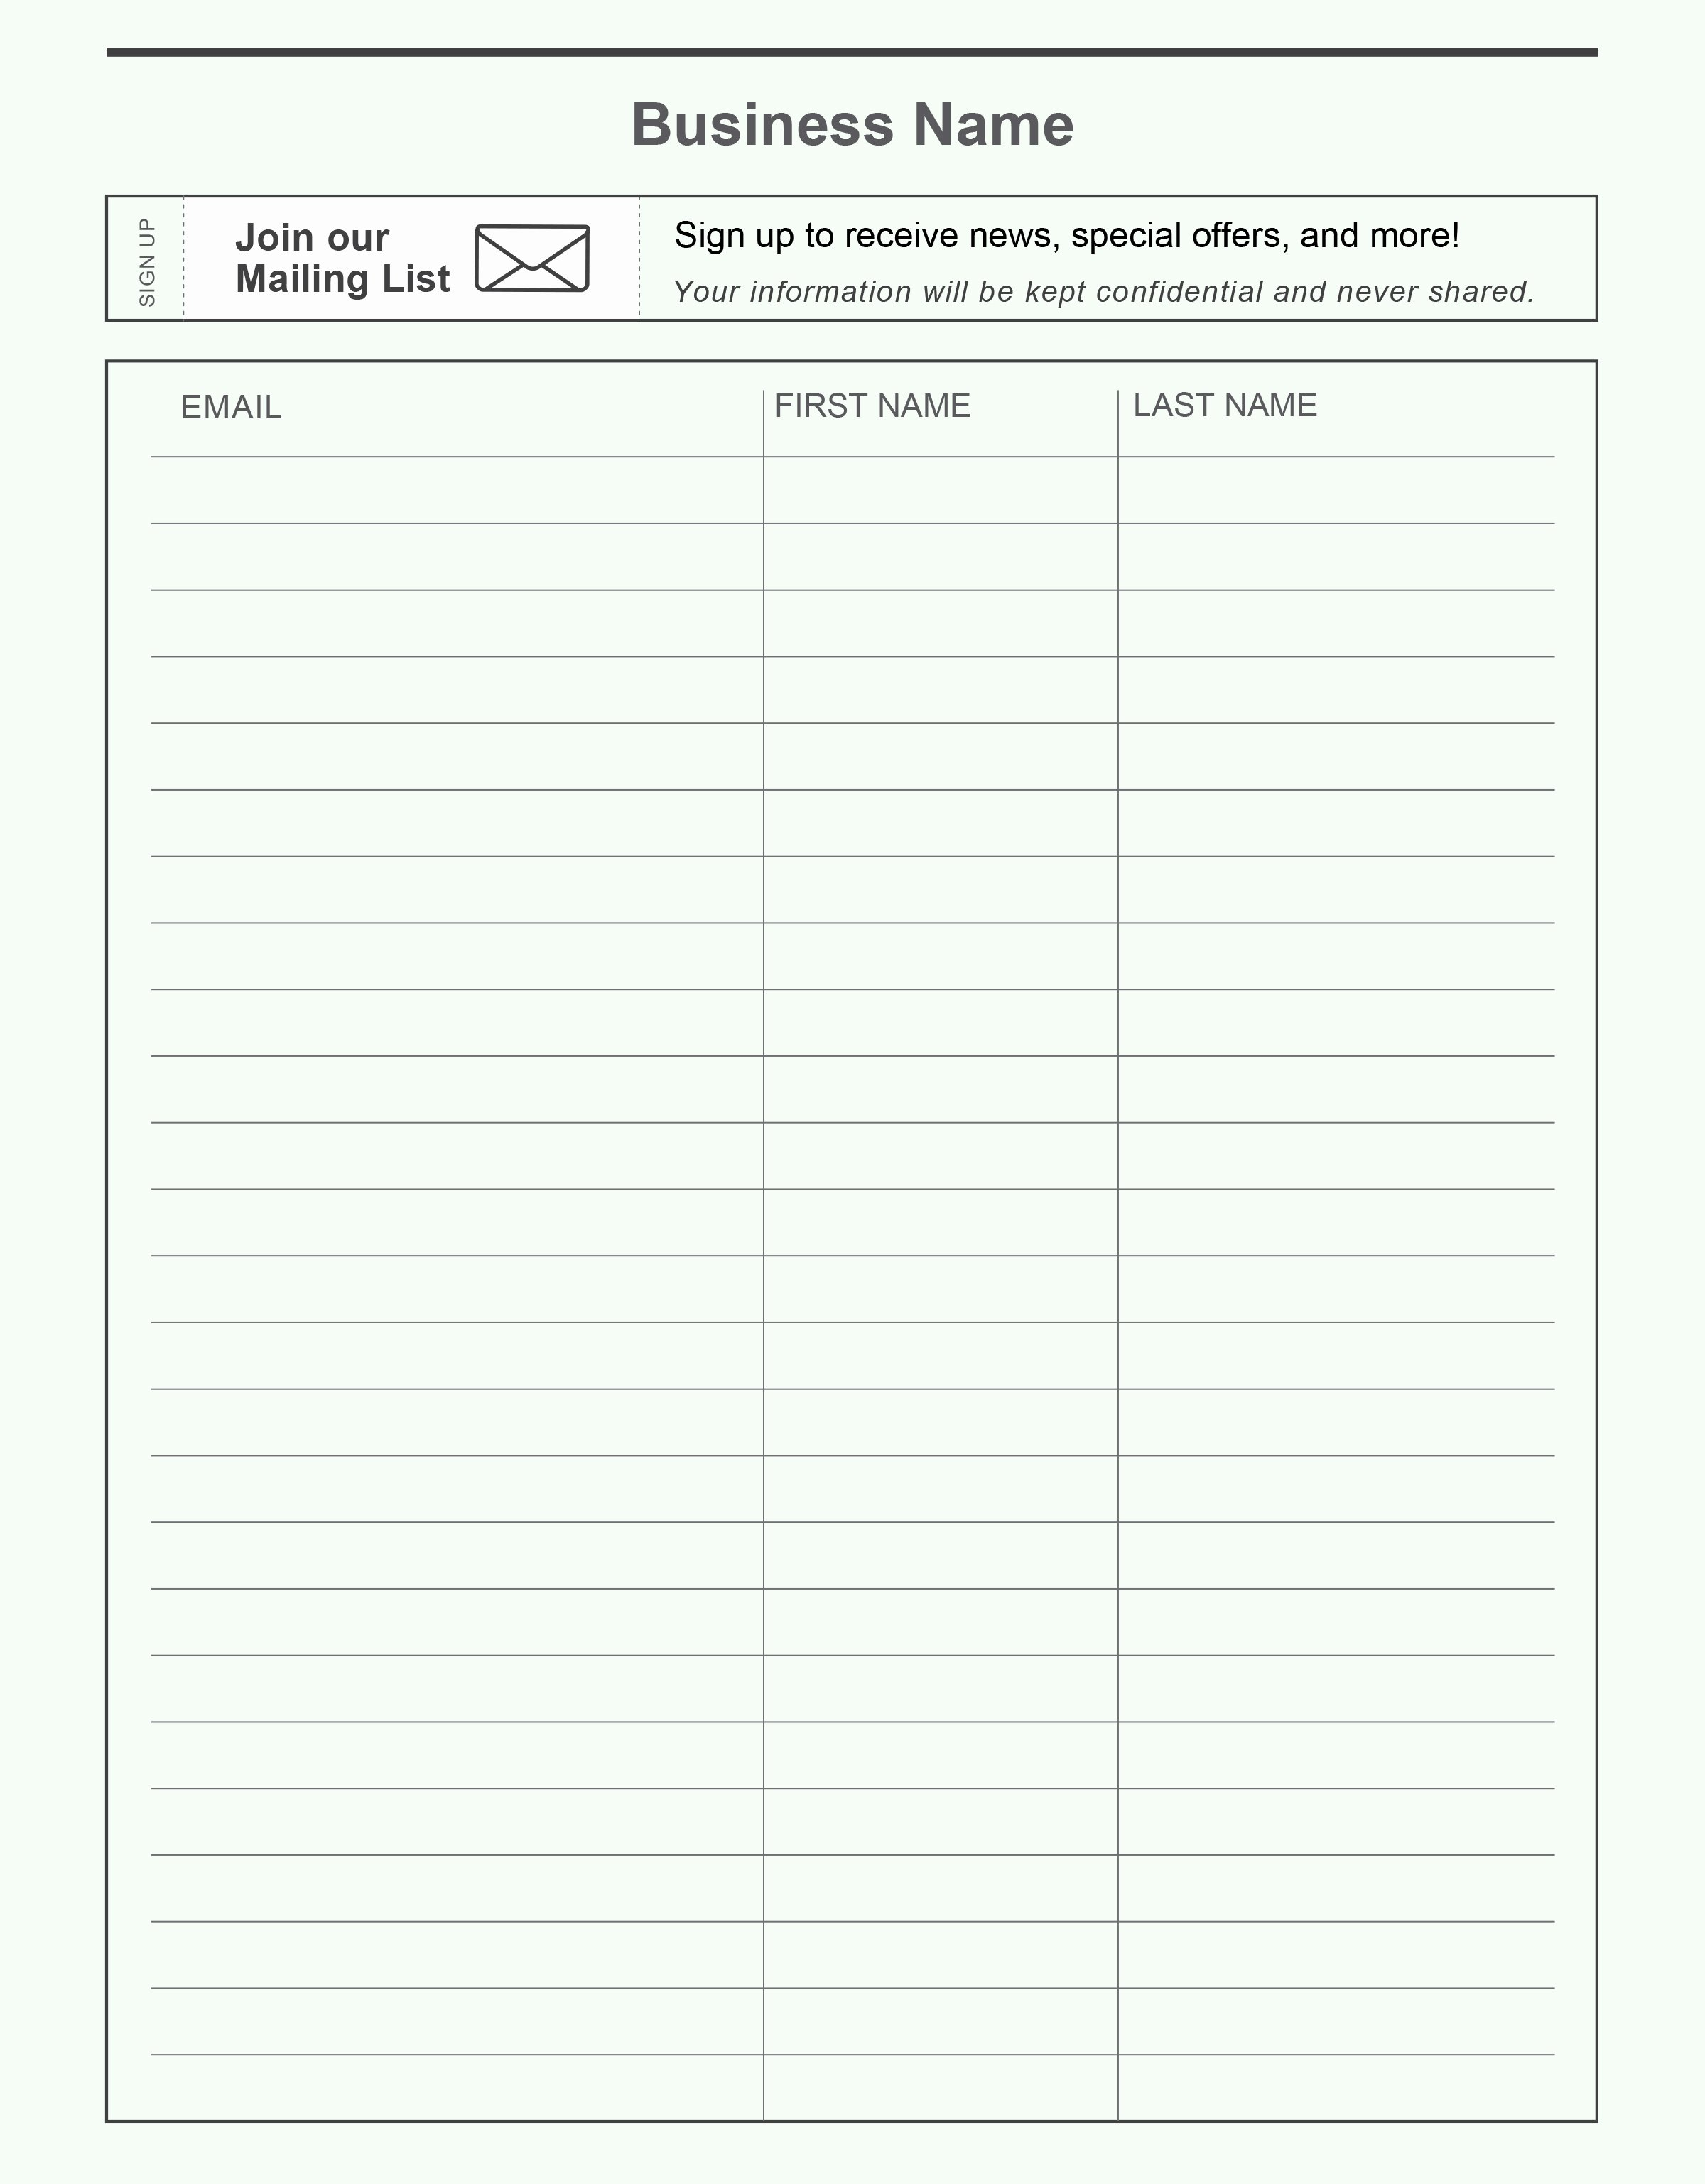 Email Sign Up form Template Elegant Name and Email Sign Up Sheet Portablegasgrillweber